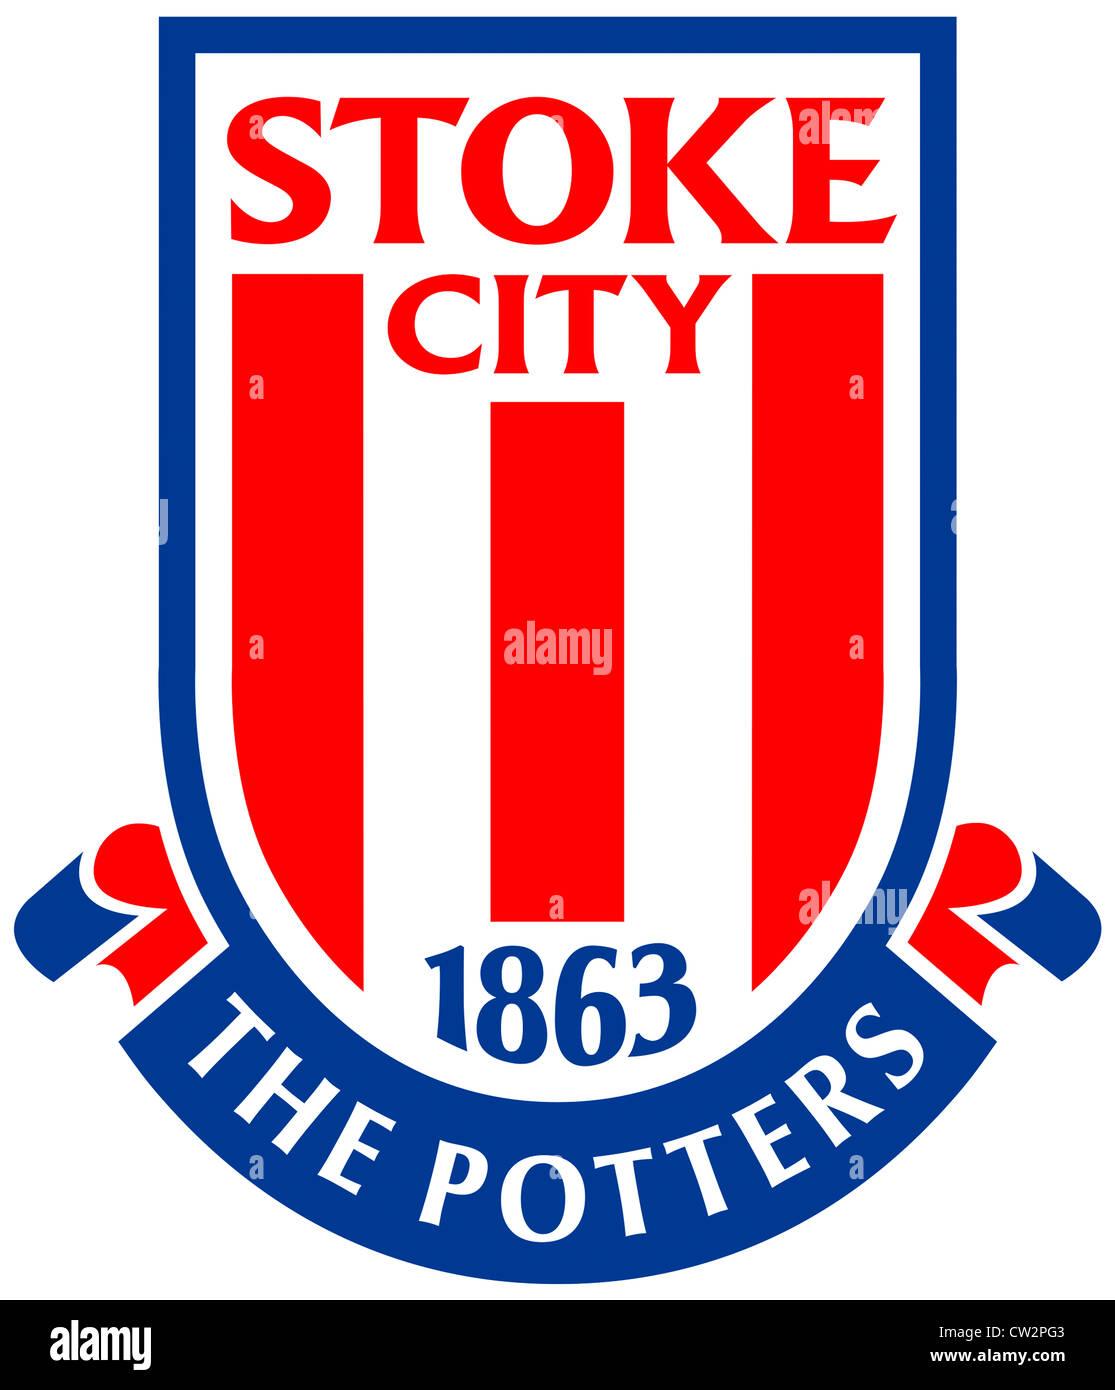 Logo of English football team Stoke City Football Club. Stock Photo